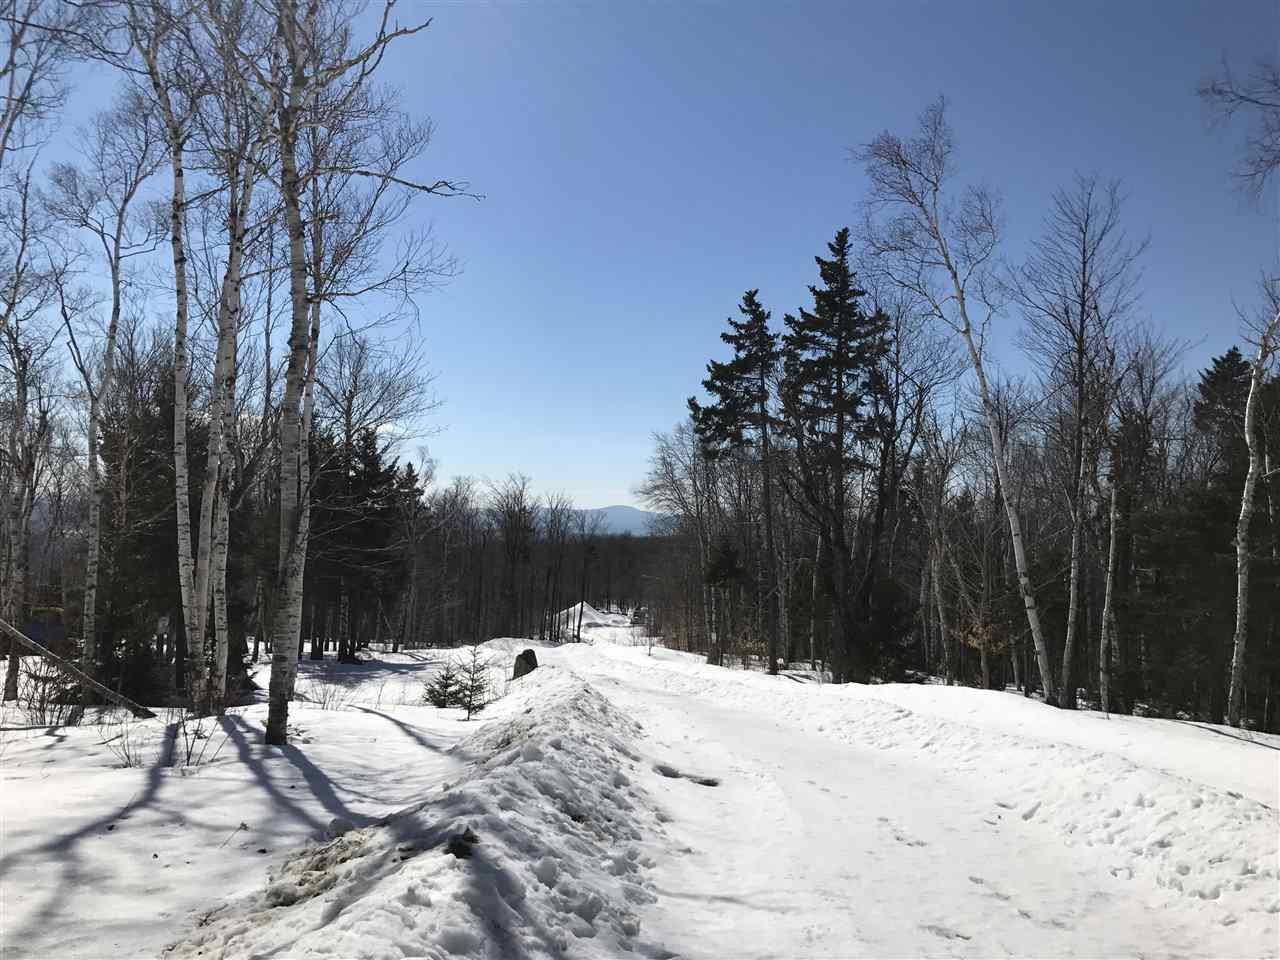 Mount-Snow-Real-Estate-4619244-1